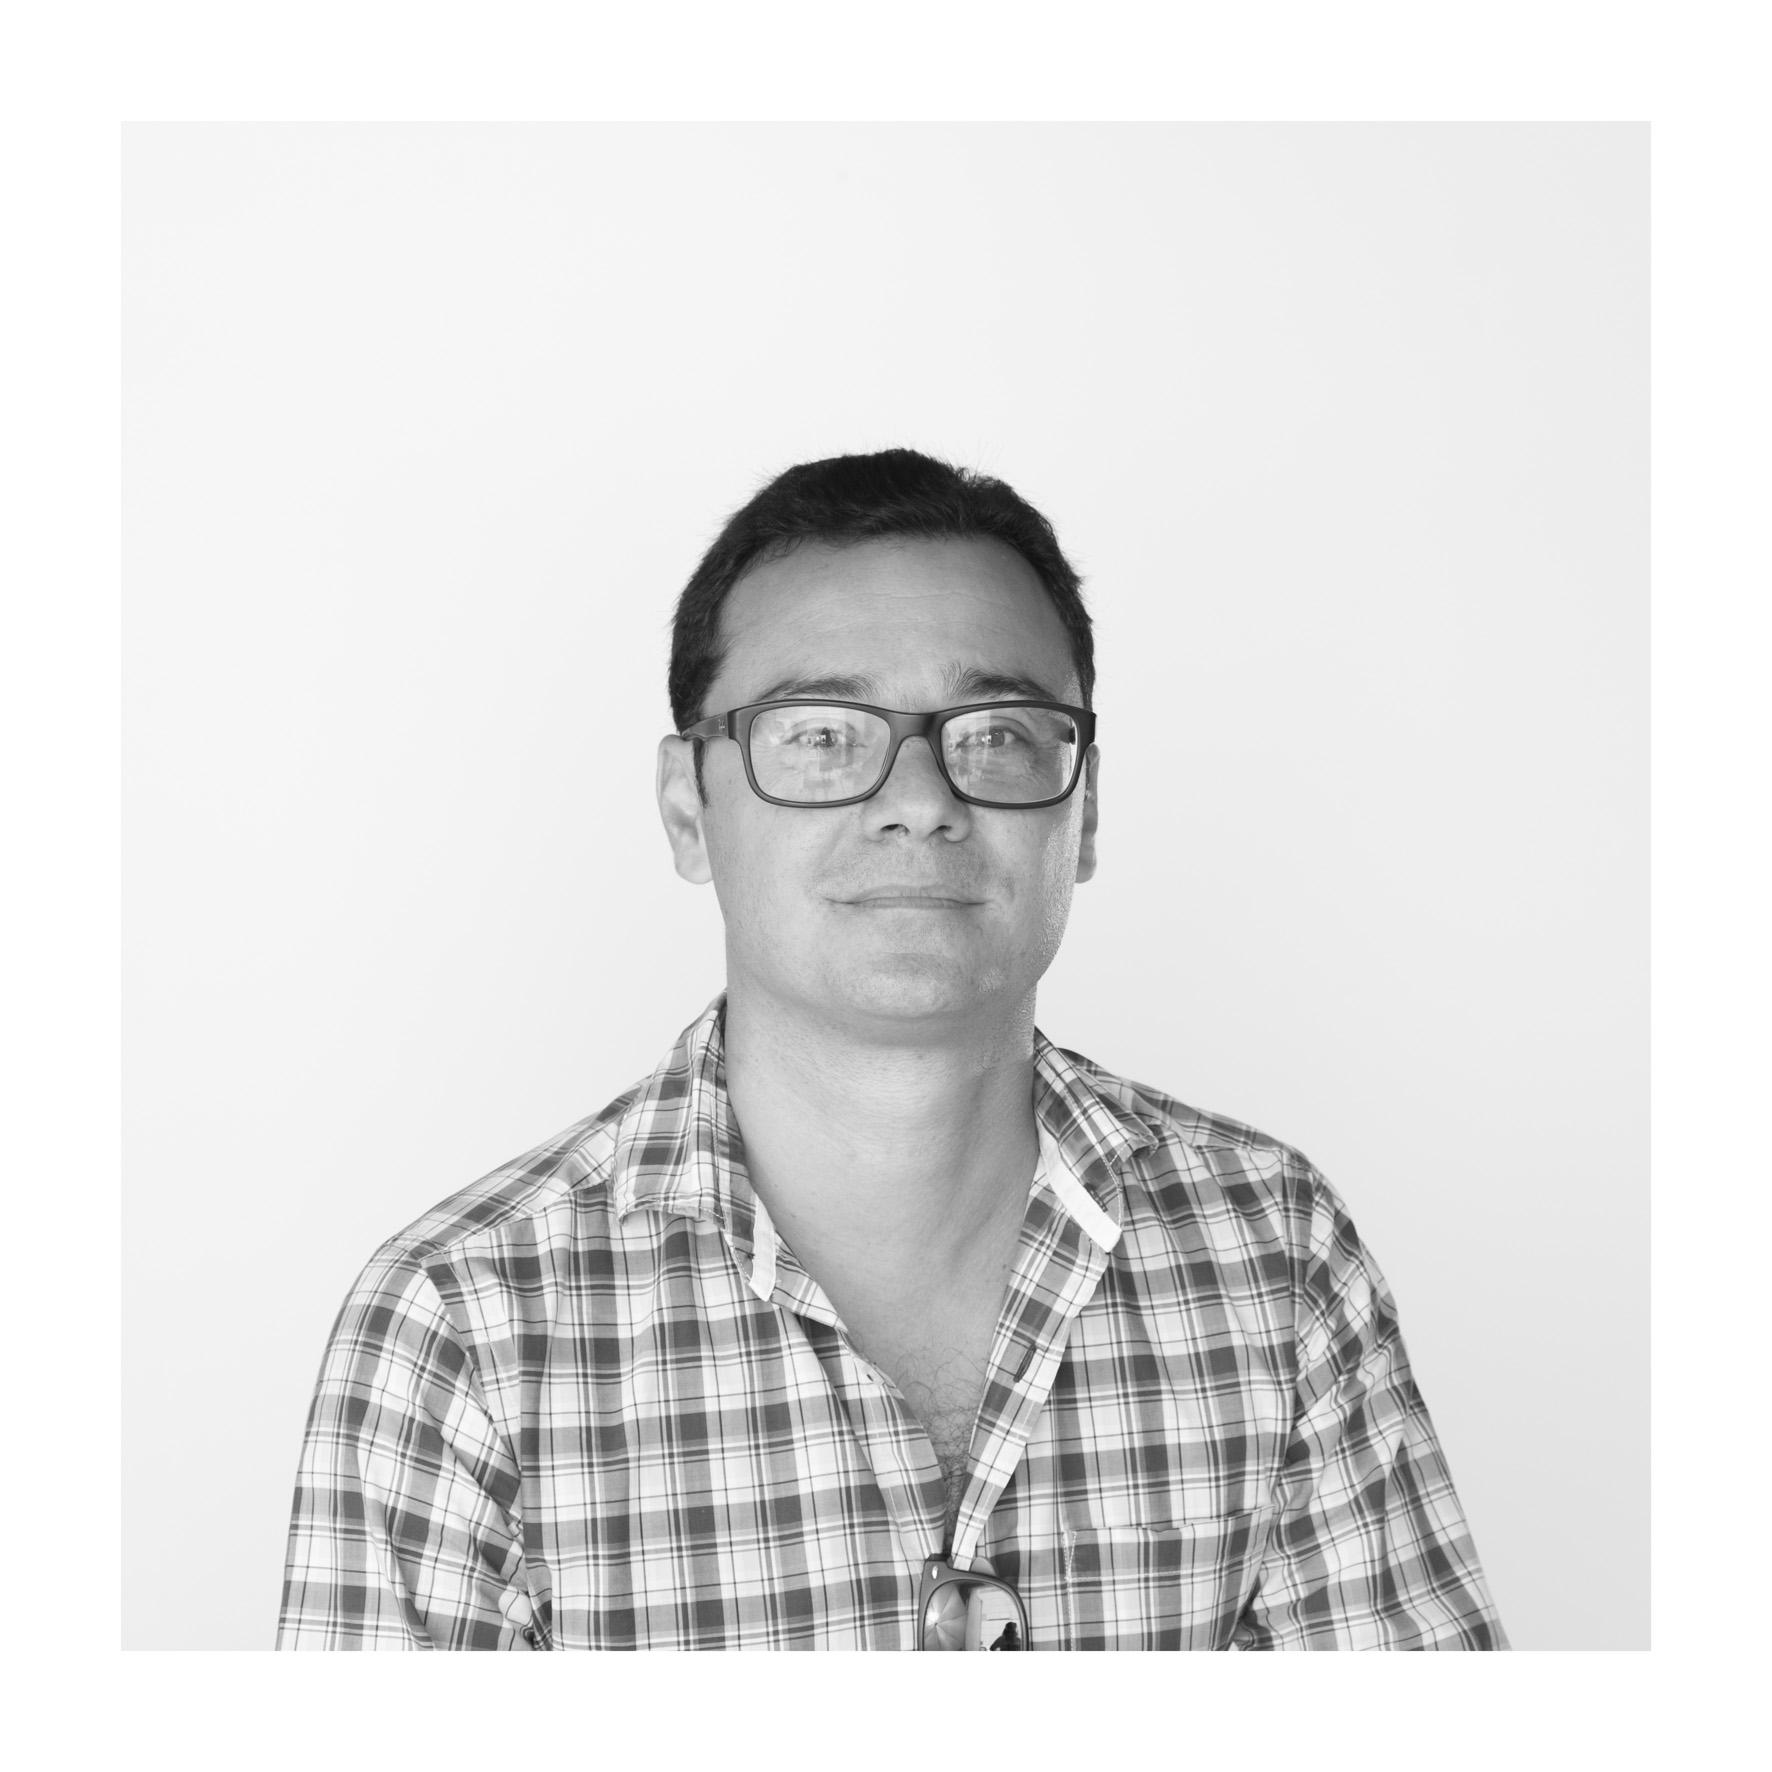 Juan Pablo Castro (juan_pablo_castro.jpg)